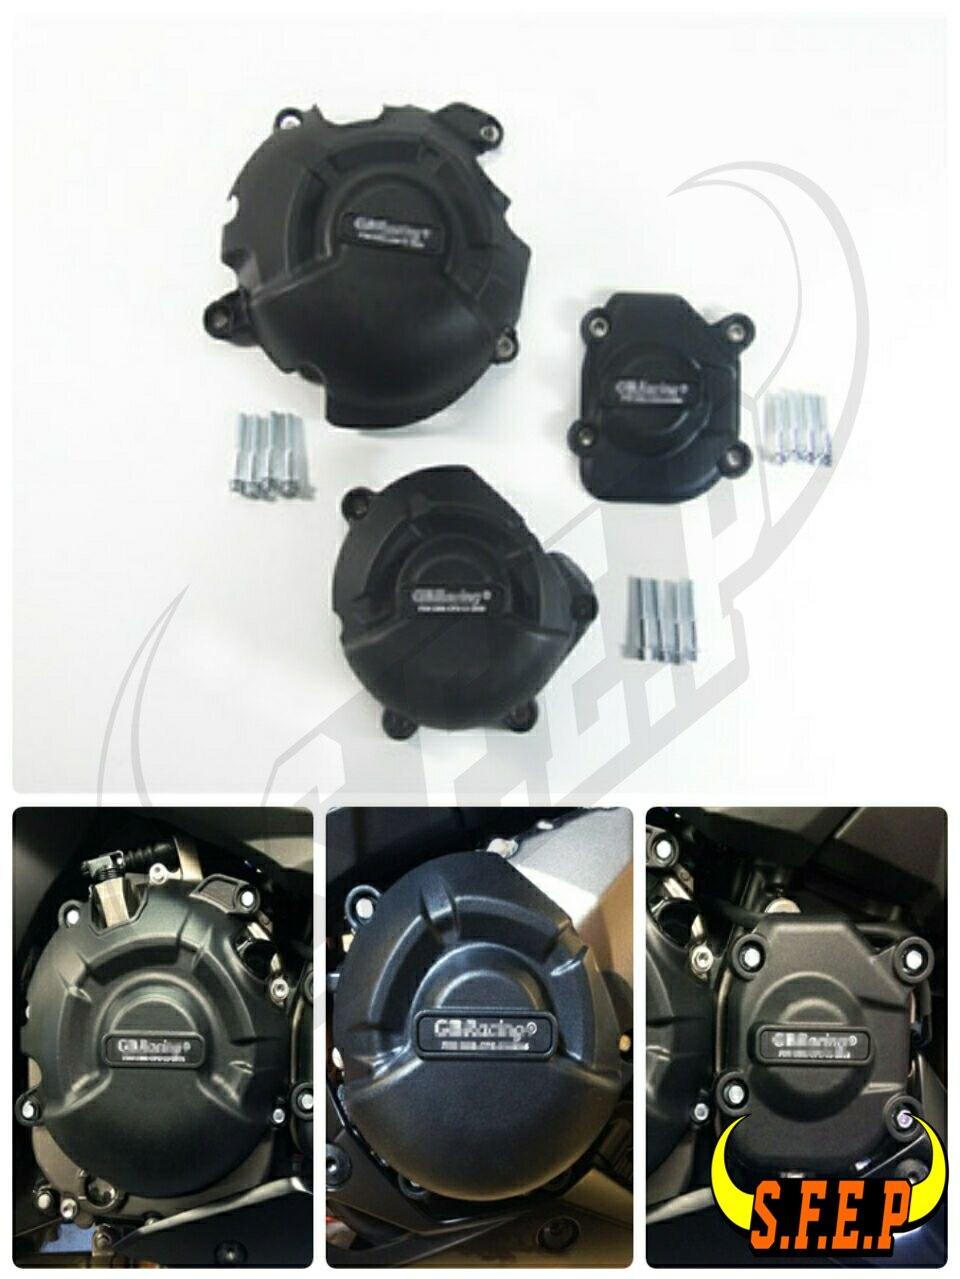 Motorcycle Engine Case Guard Protector Cover GB Racing For Kawasaki Z800 2013 2014 2015 2016 Black